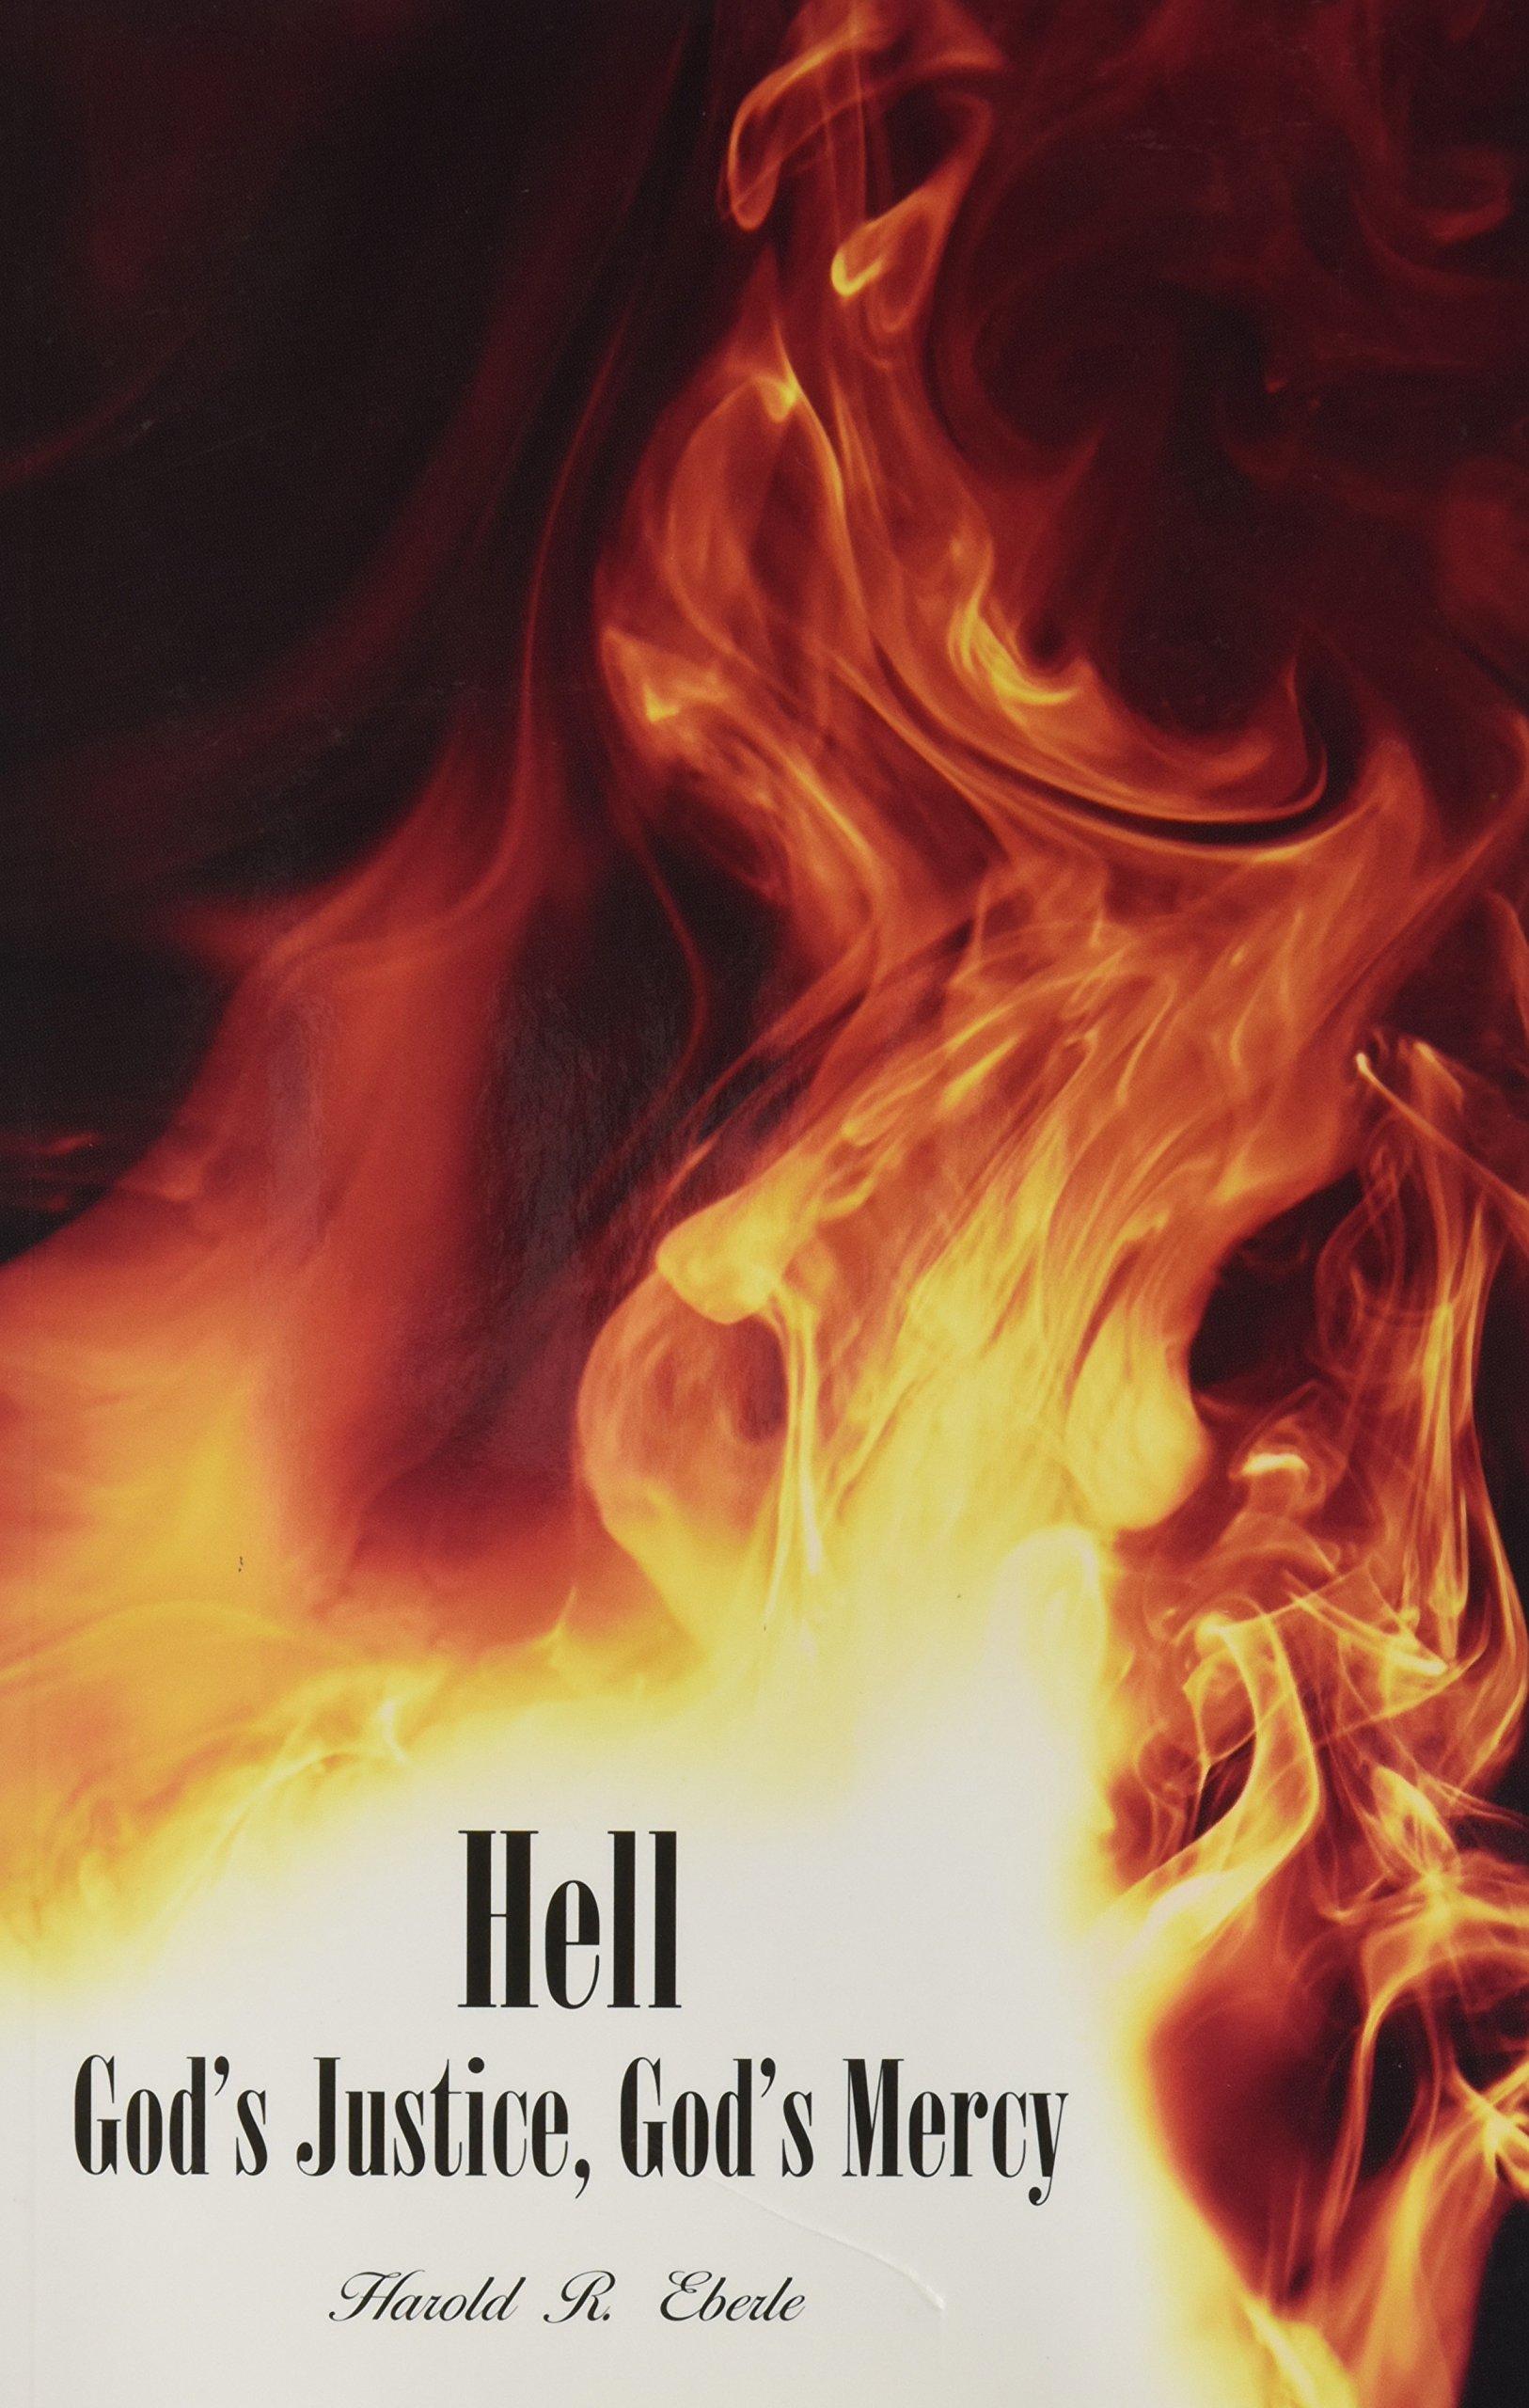 Hell gods justice gods mercy harold eberle 9781882523290 hell gods justice gods mercy harold eberle 9781882523290 amazon books fandeluxe Choice Image